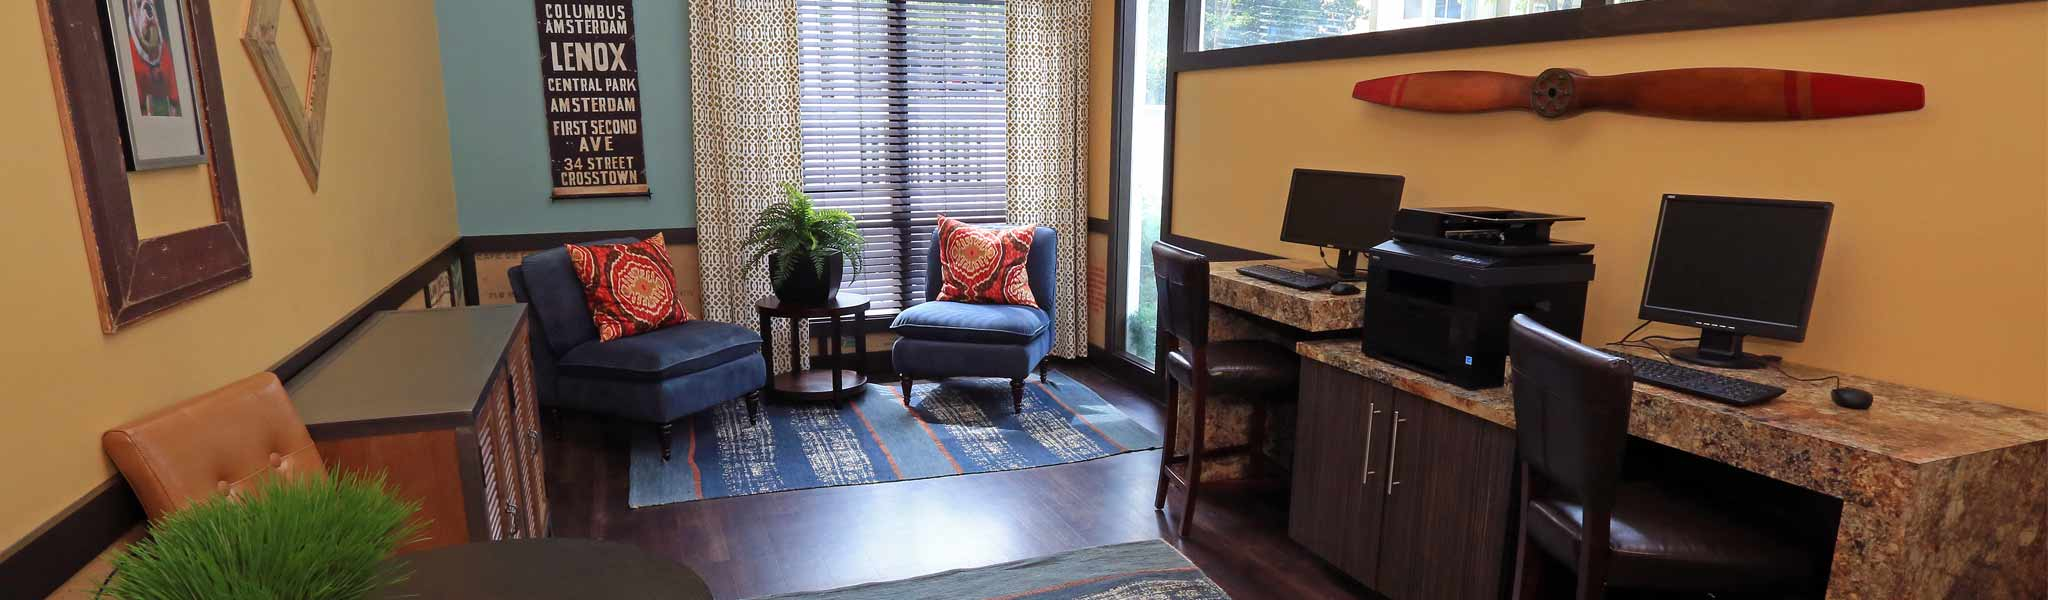 Sandy Springs Ga Apartments For Rent Aspen Square Management